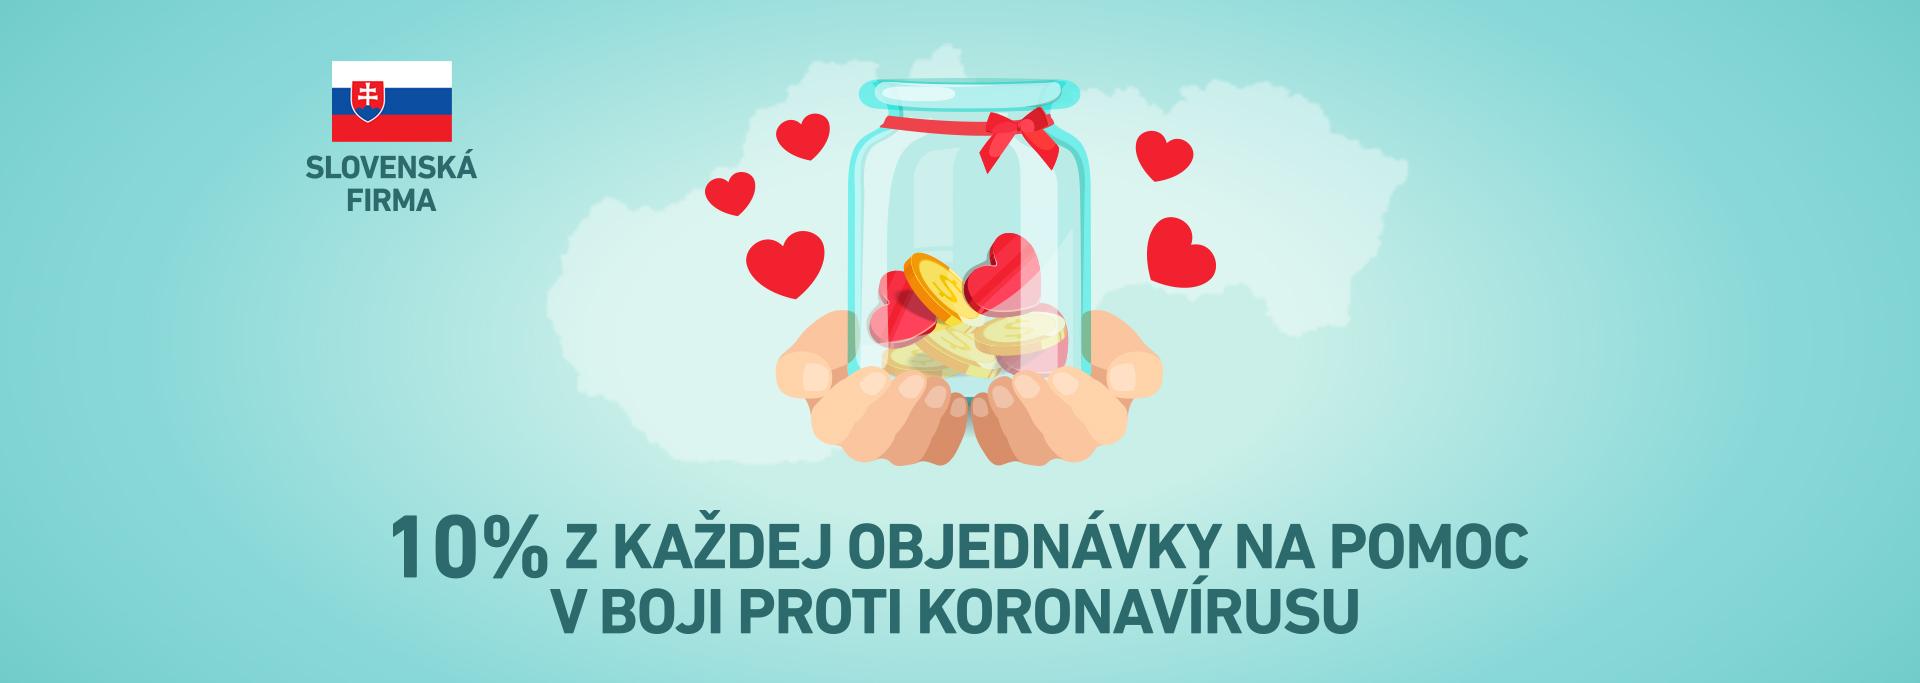 banner_podstranka4